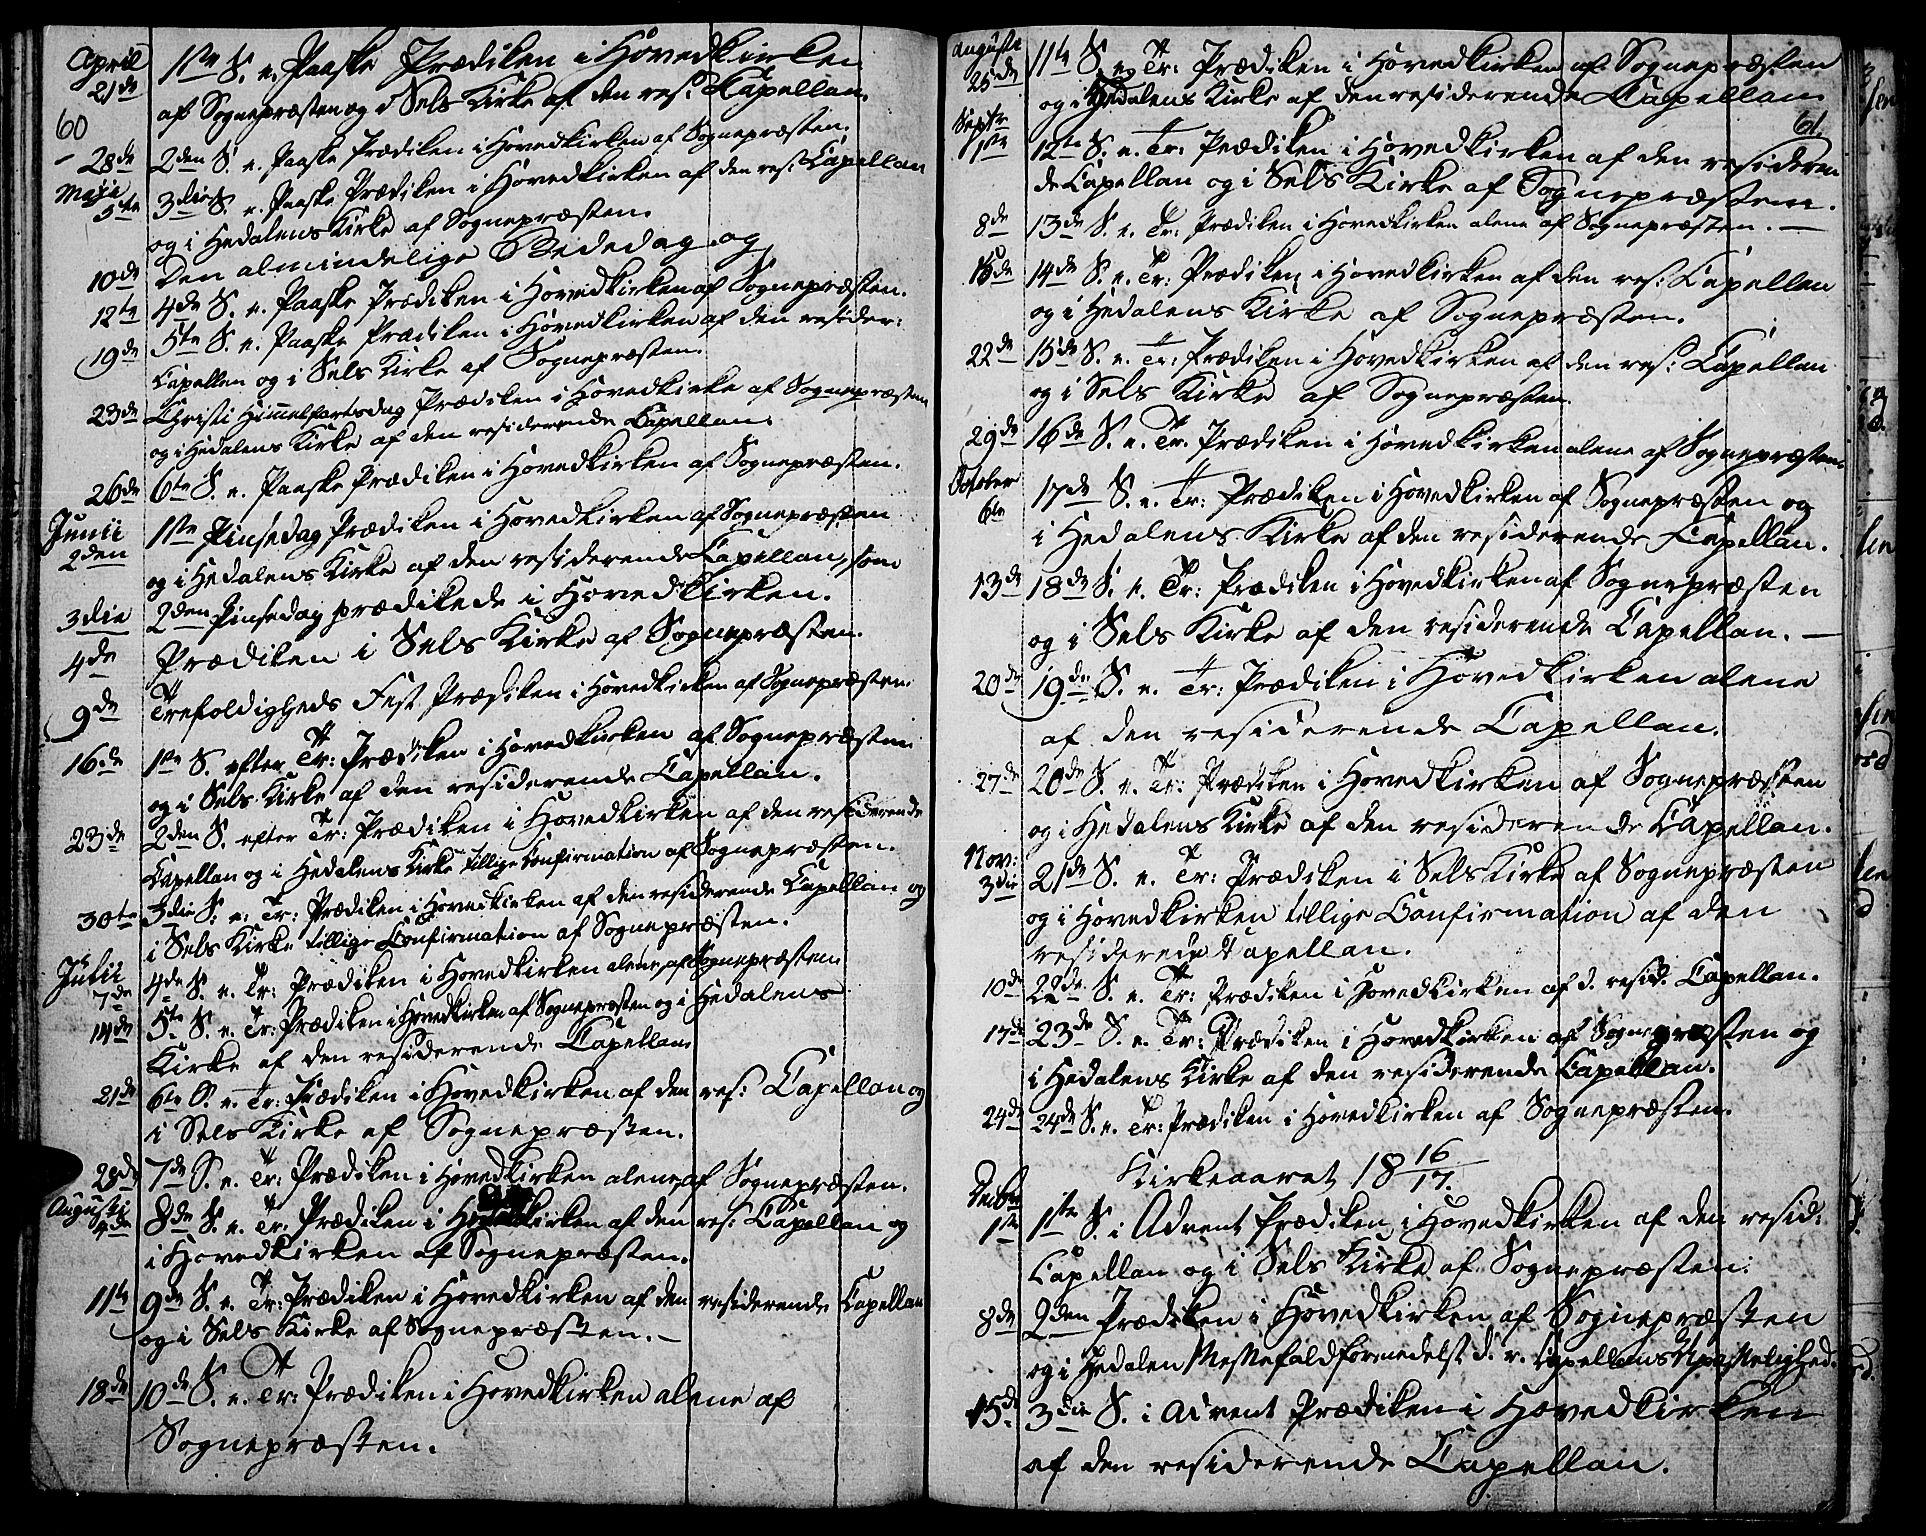 SAH, Vågå prestekontor, Ministerialbok nr. 2, 1810-1815, s. 60-61